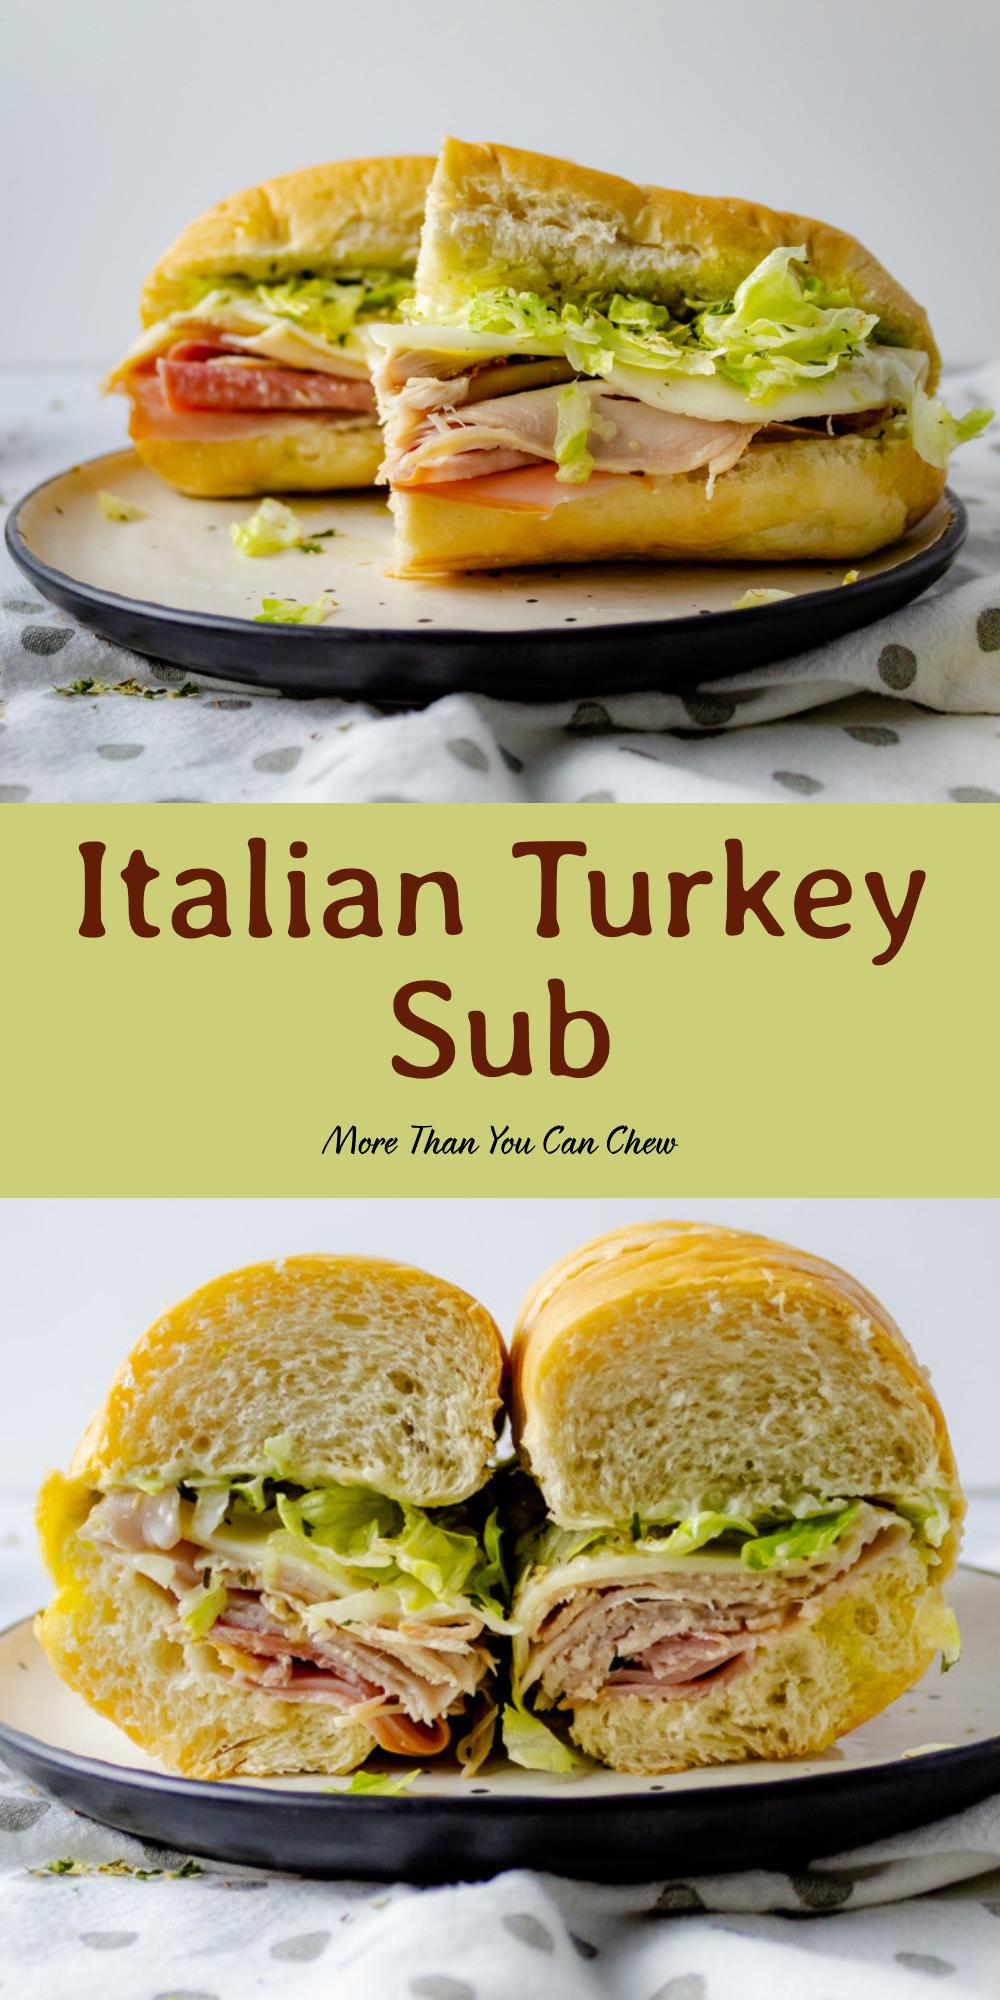 Italian Turkey Sub